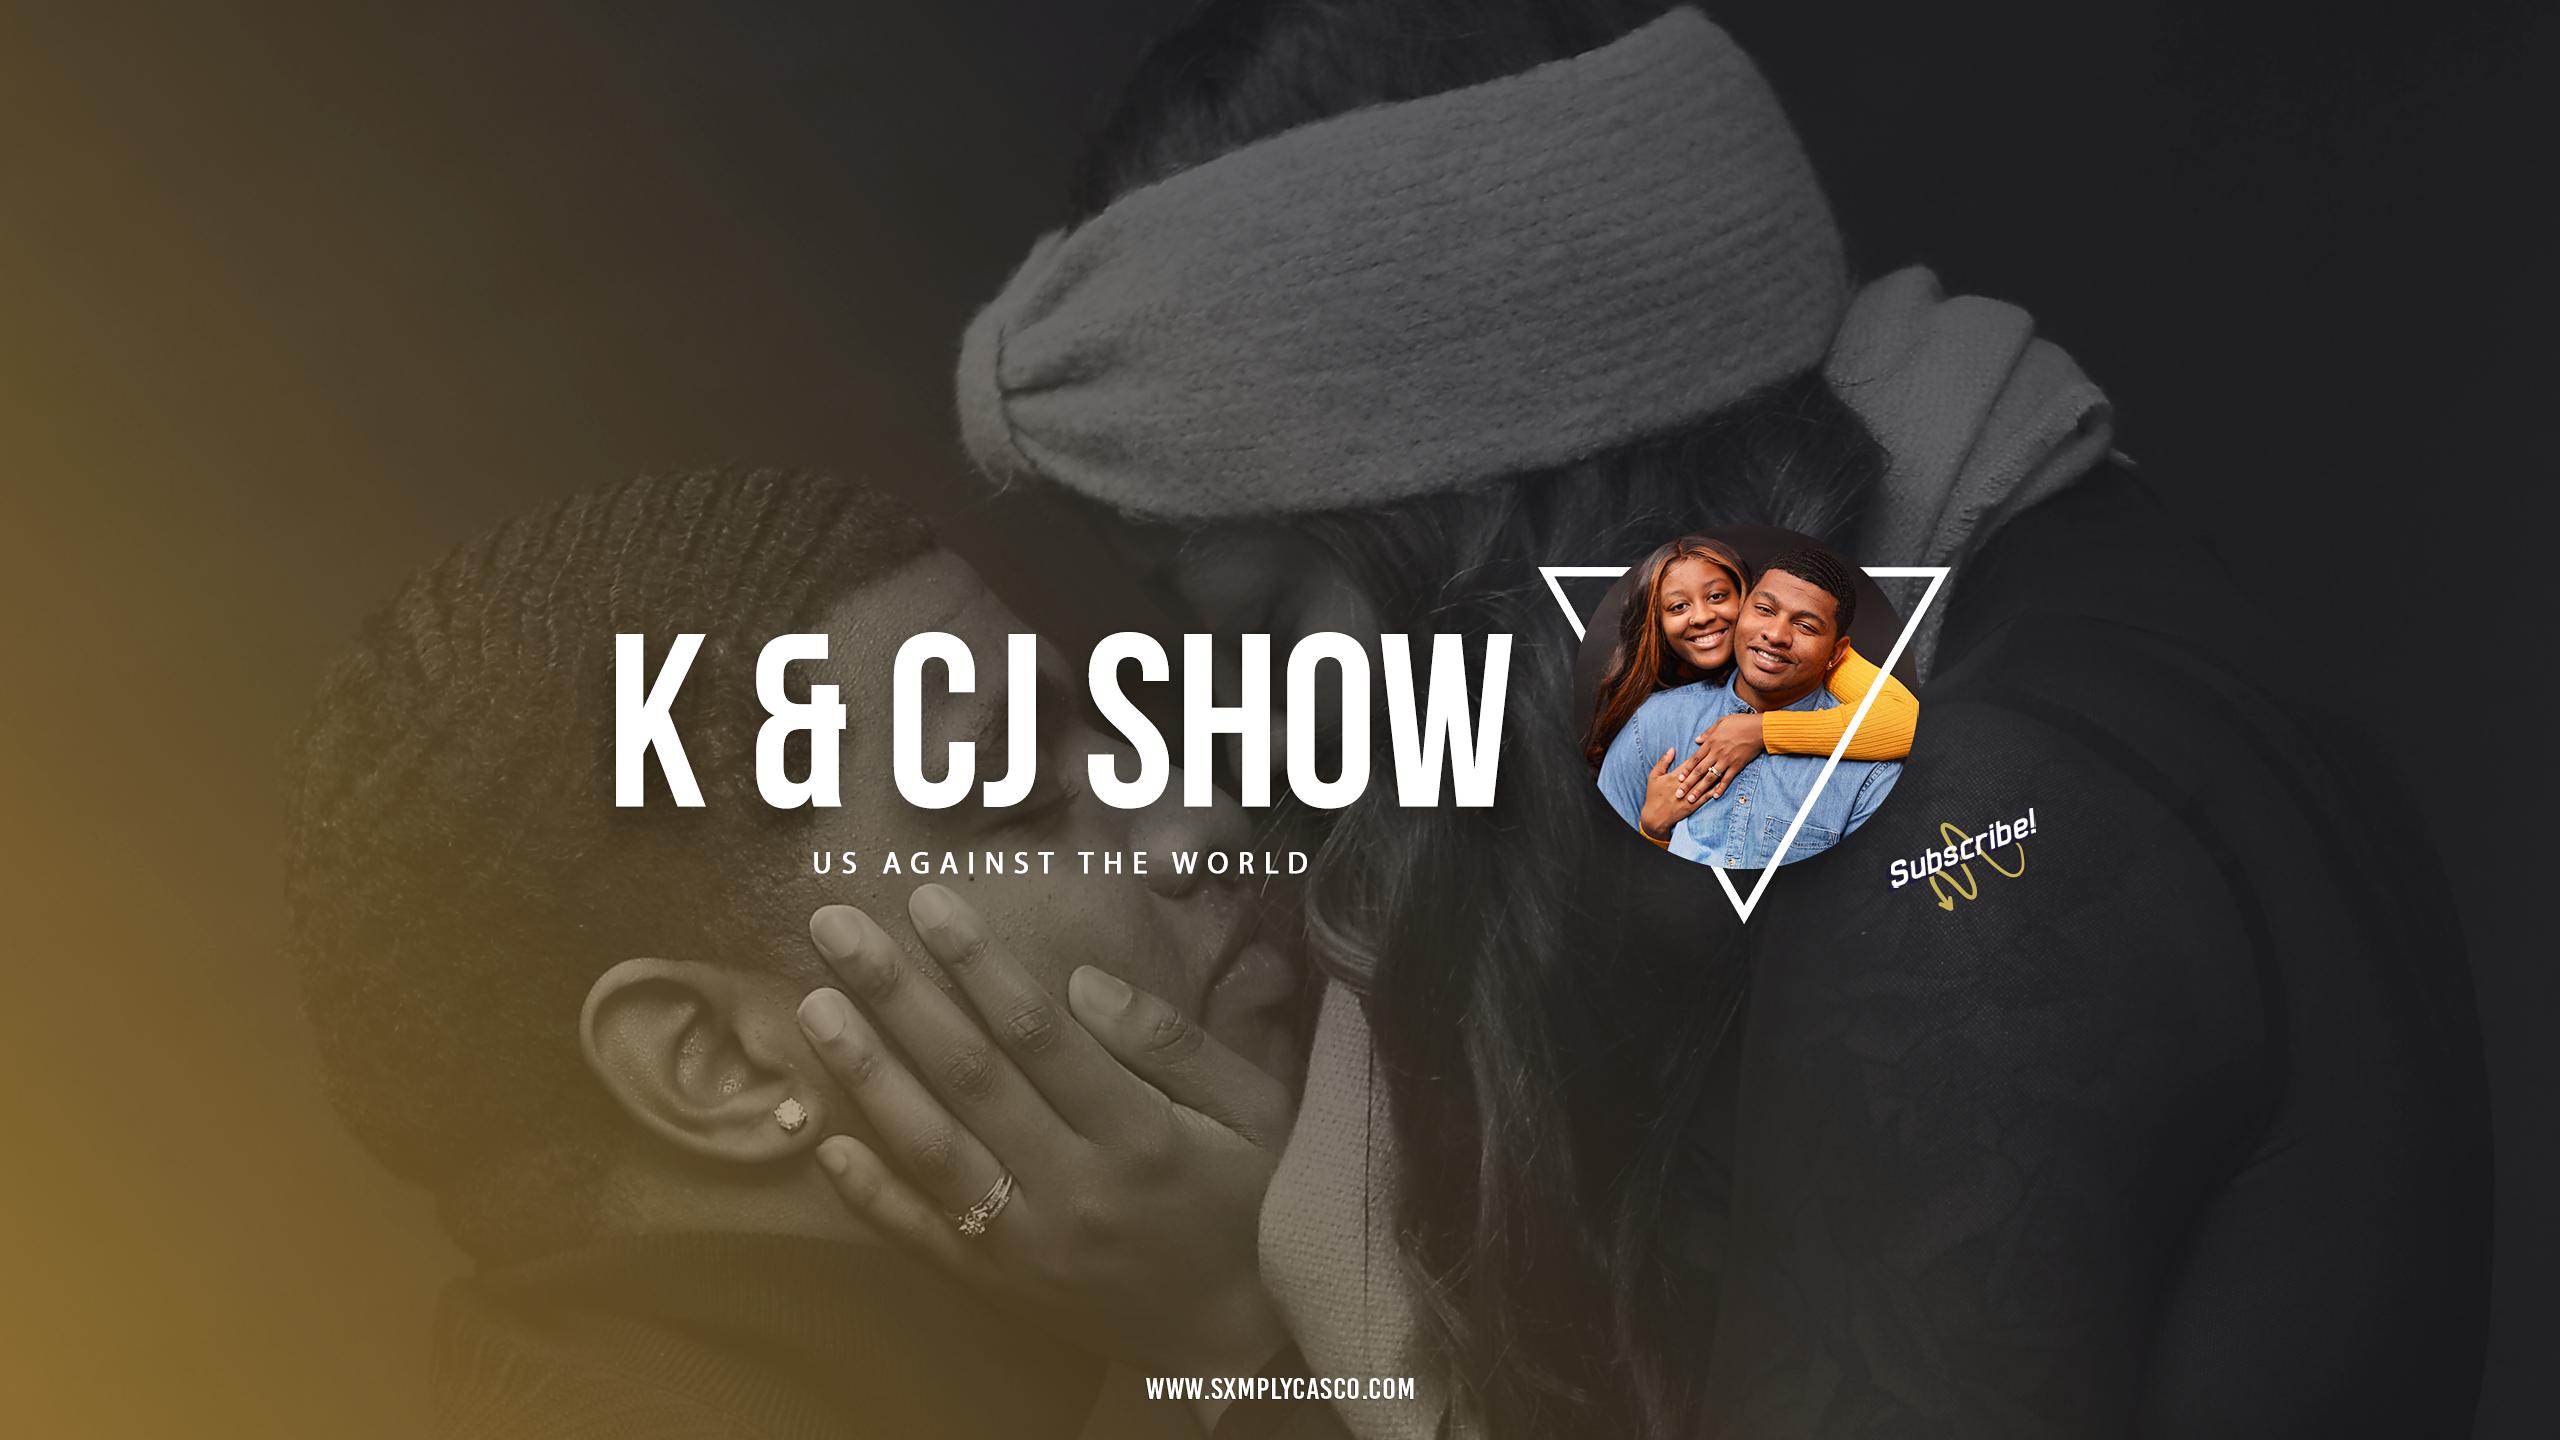 K&CJ channel banner